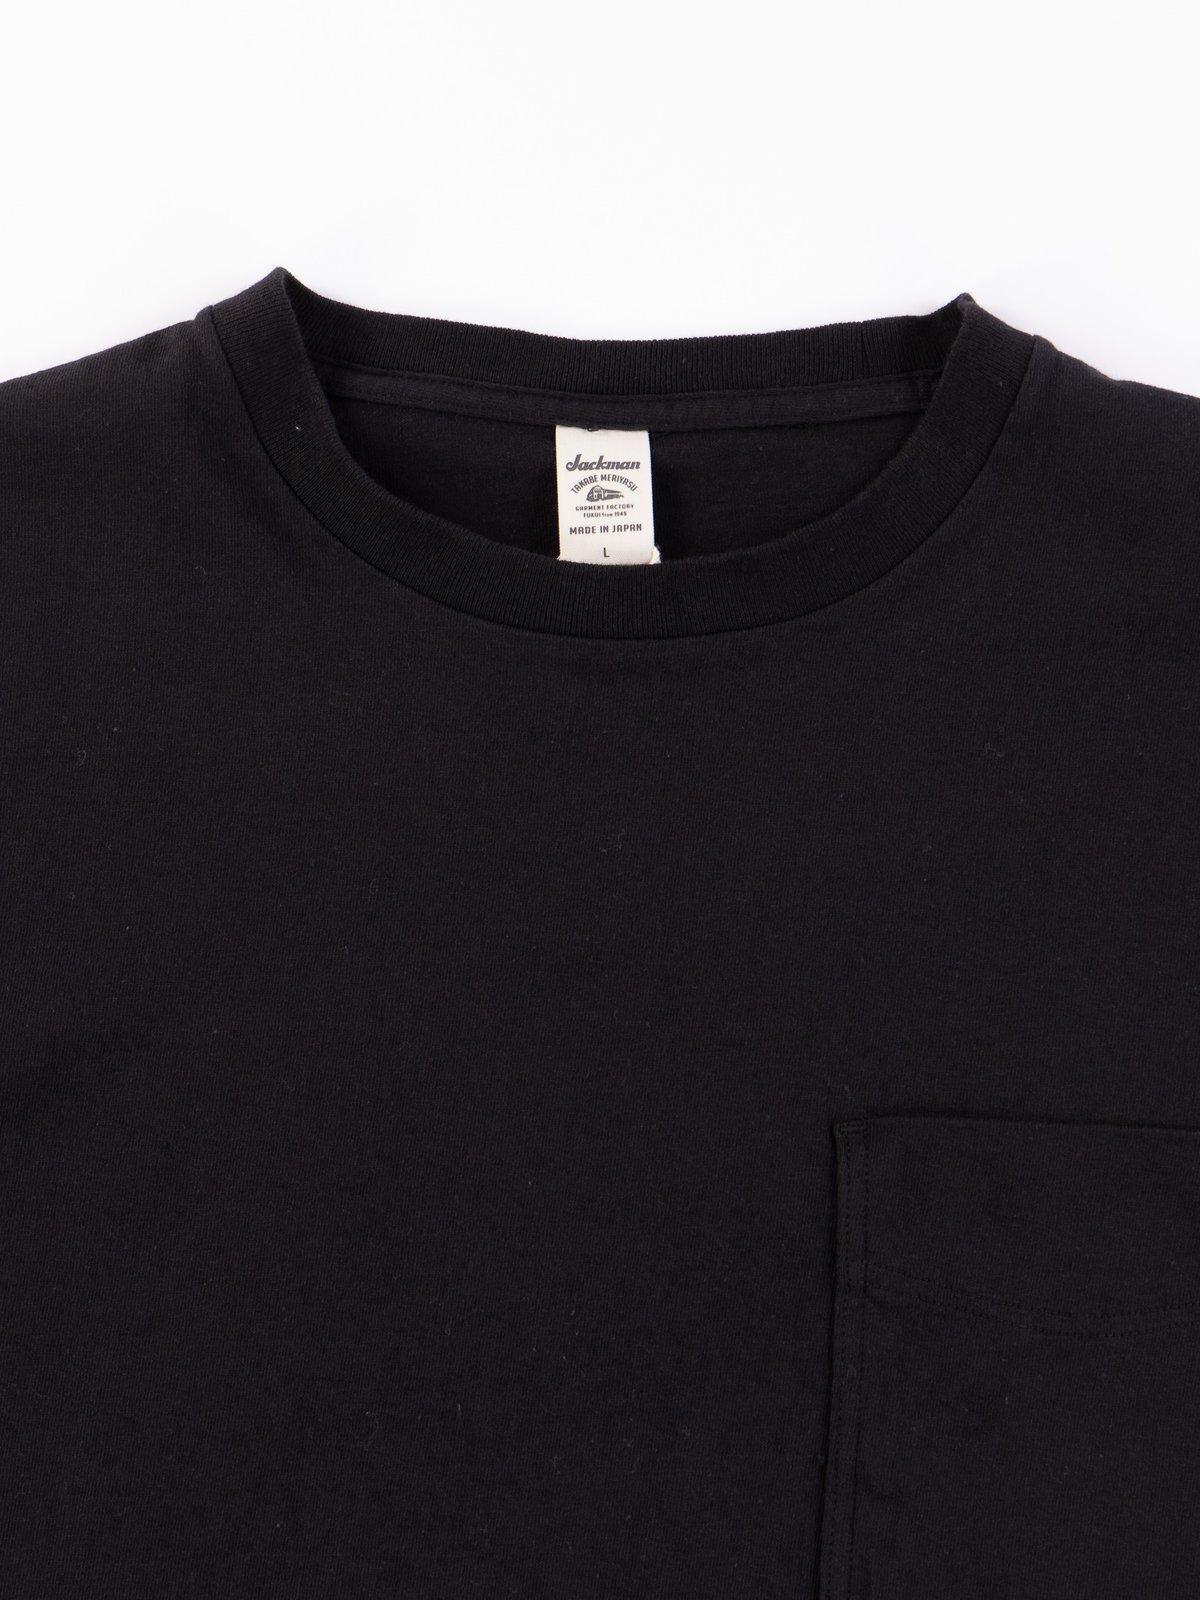 Black Pocket T–Shirt - Image 3